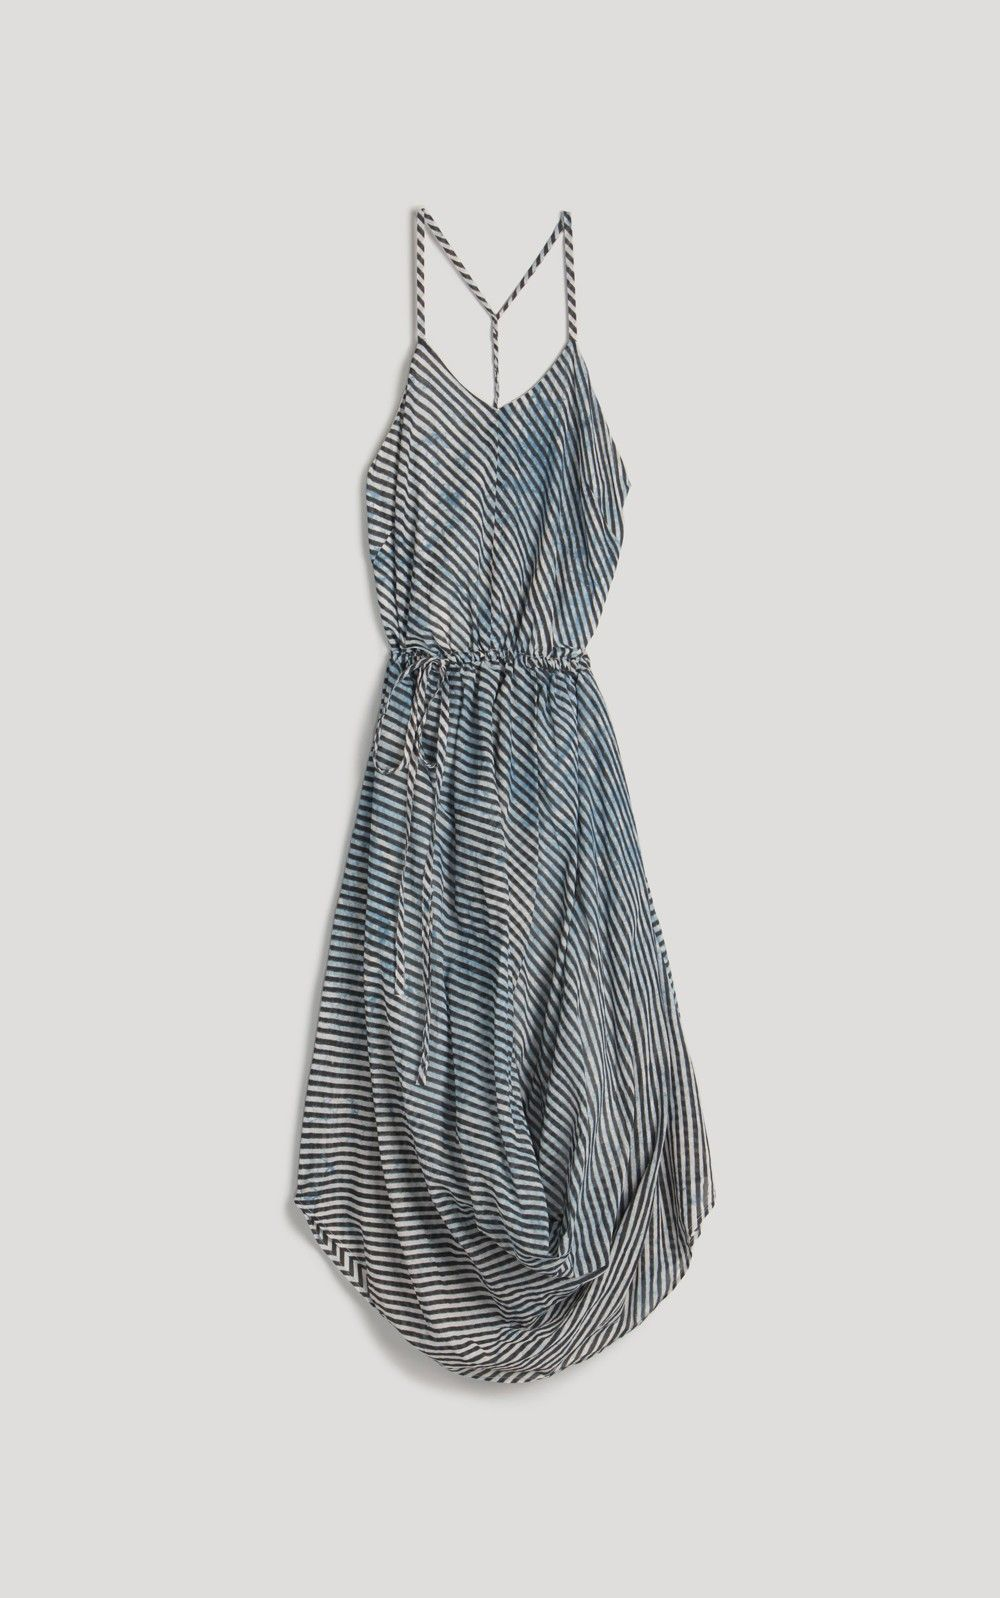 6b3cfe96810a7 Summer dress | Quotes | Women, Fashion, Summer dresses